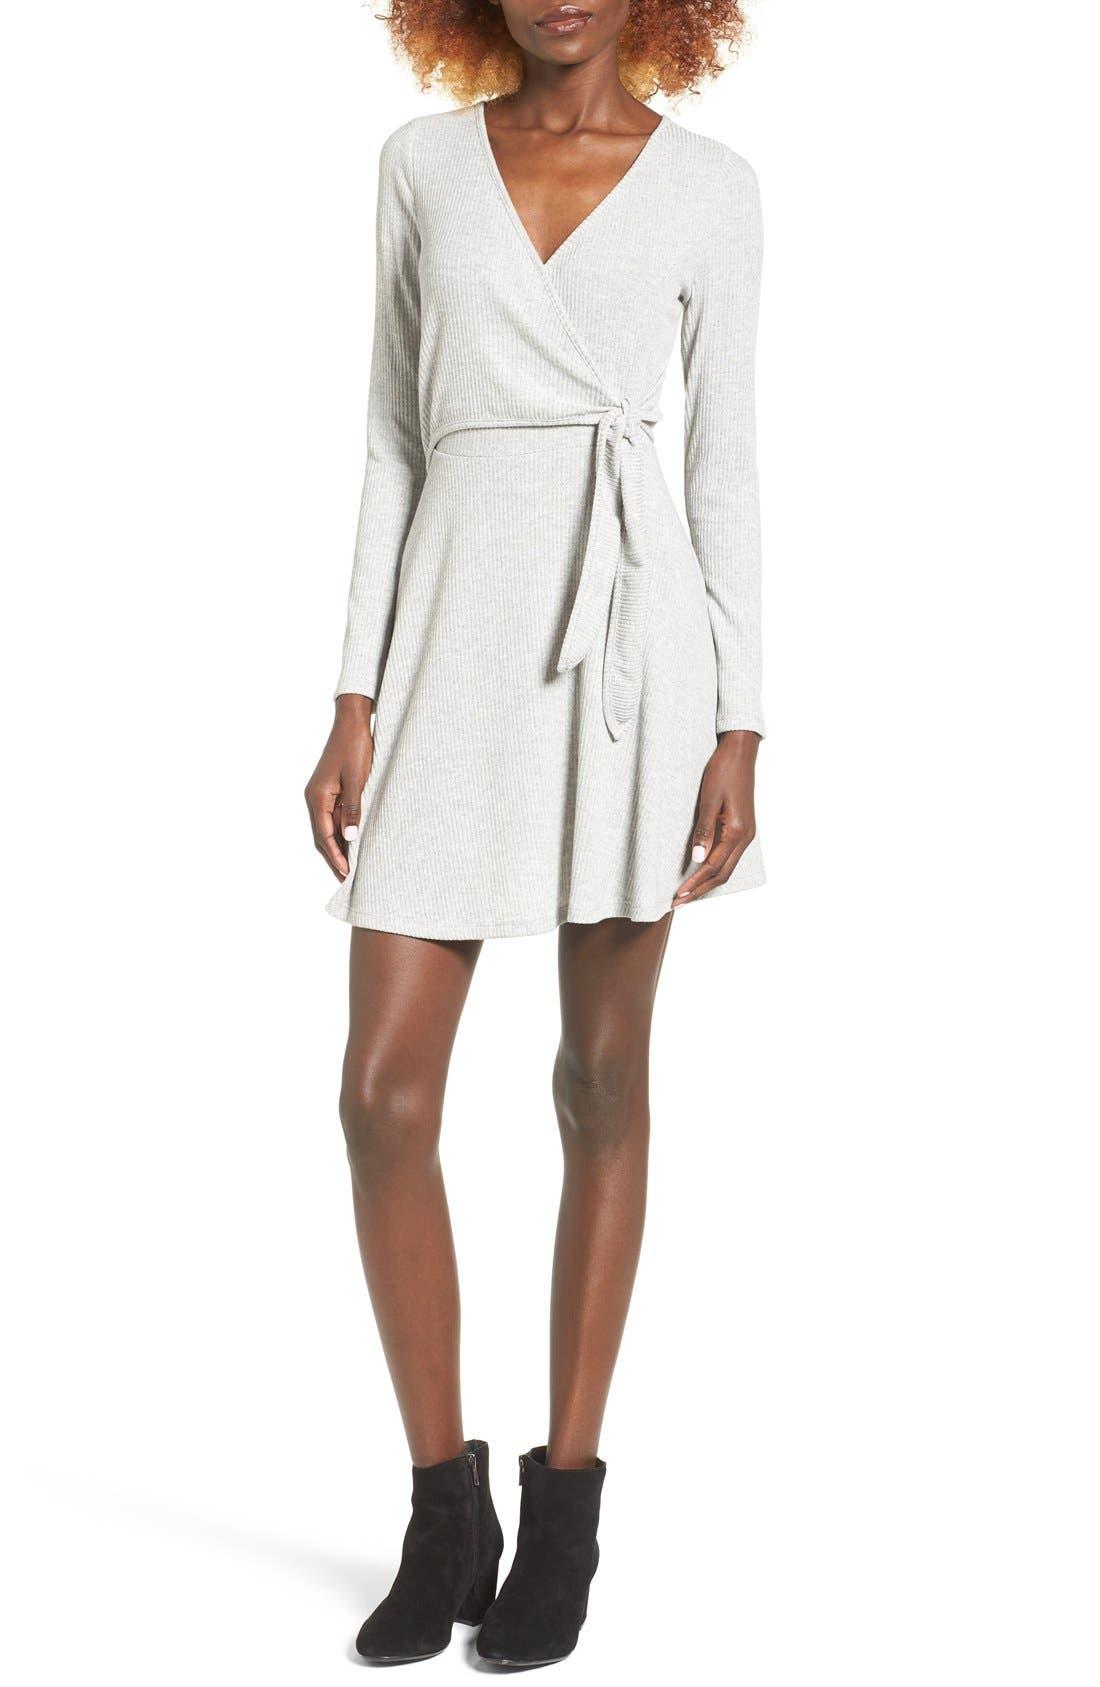 Alternate Image 1 Selected - Everly Rib Knit Wrap Dress